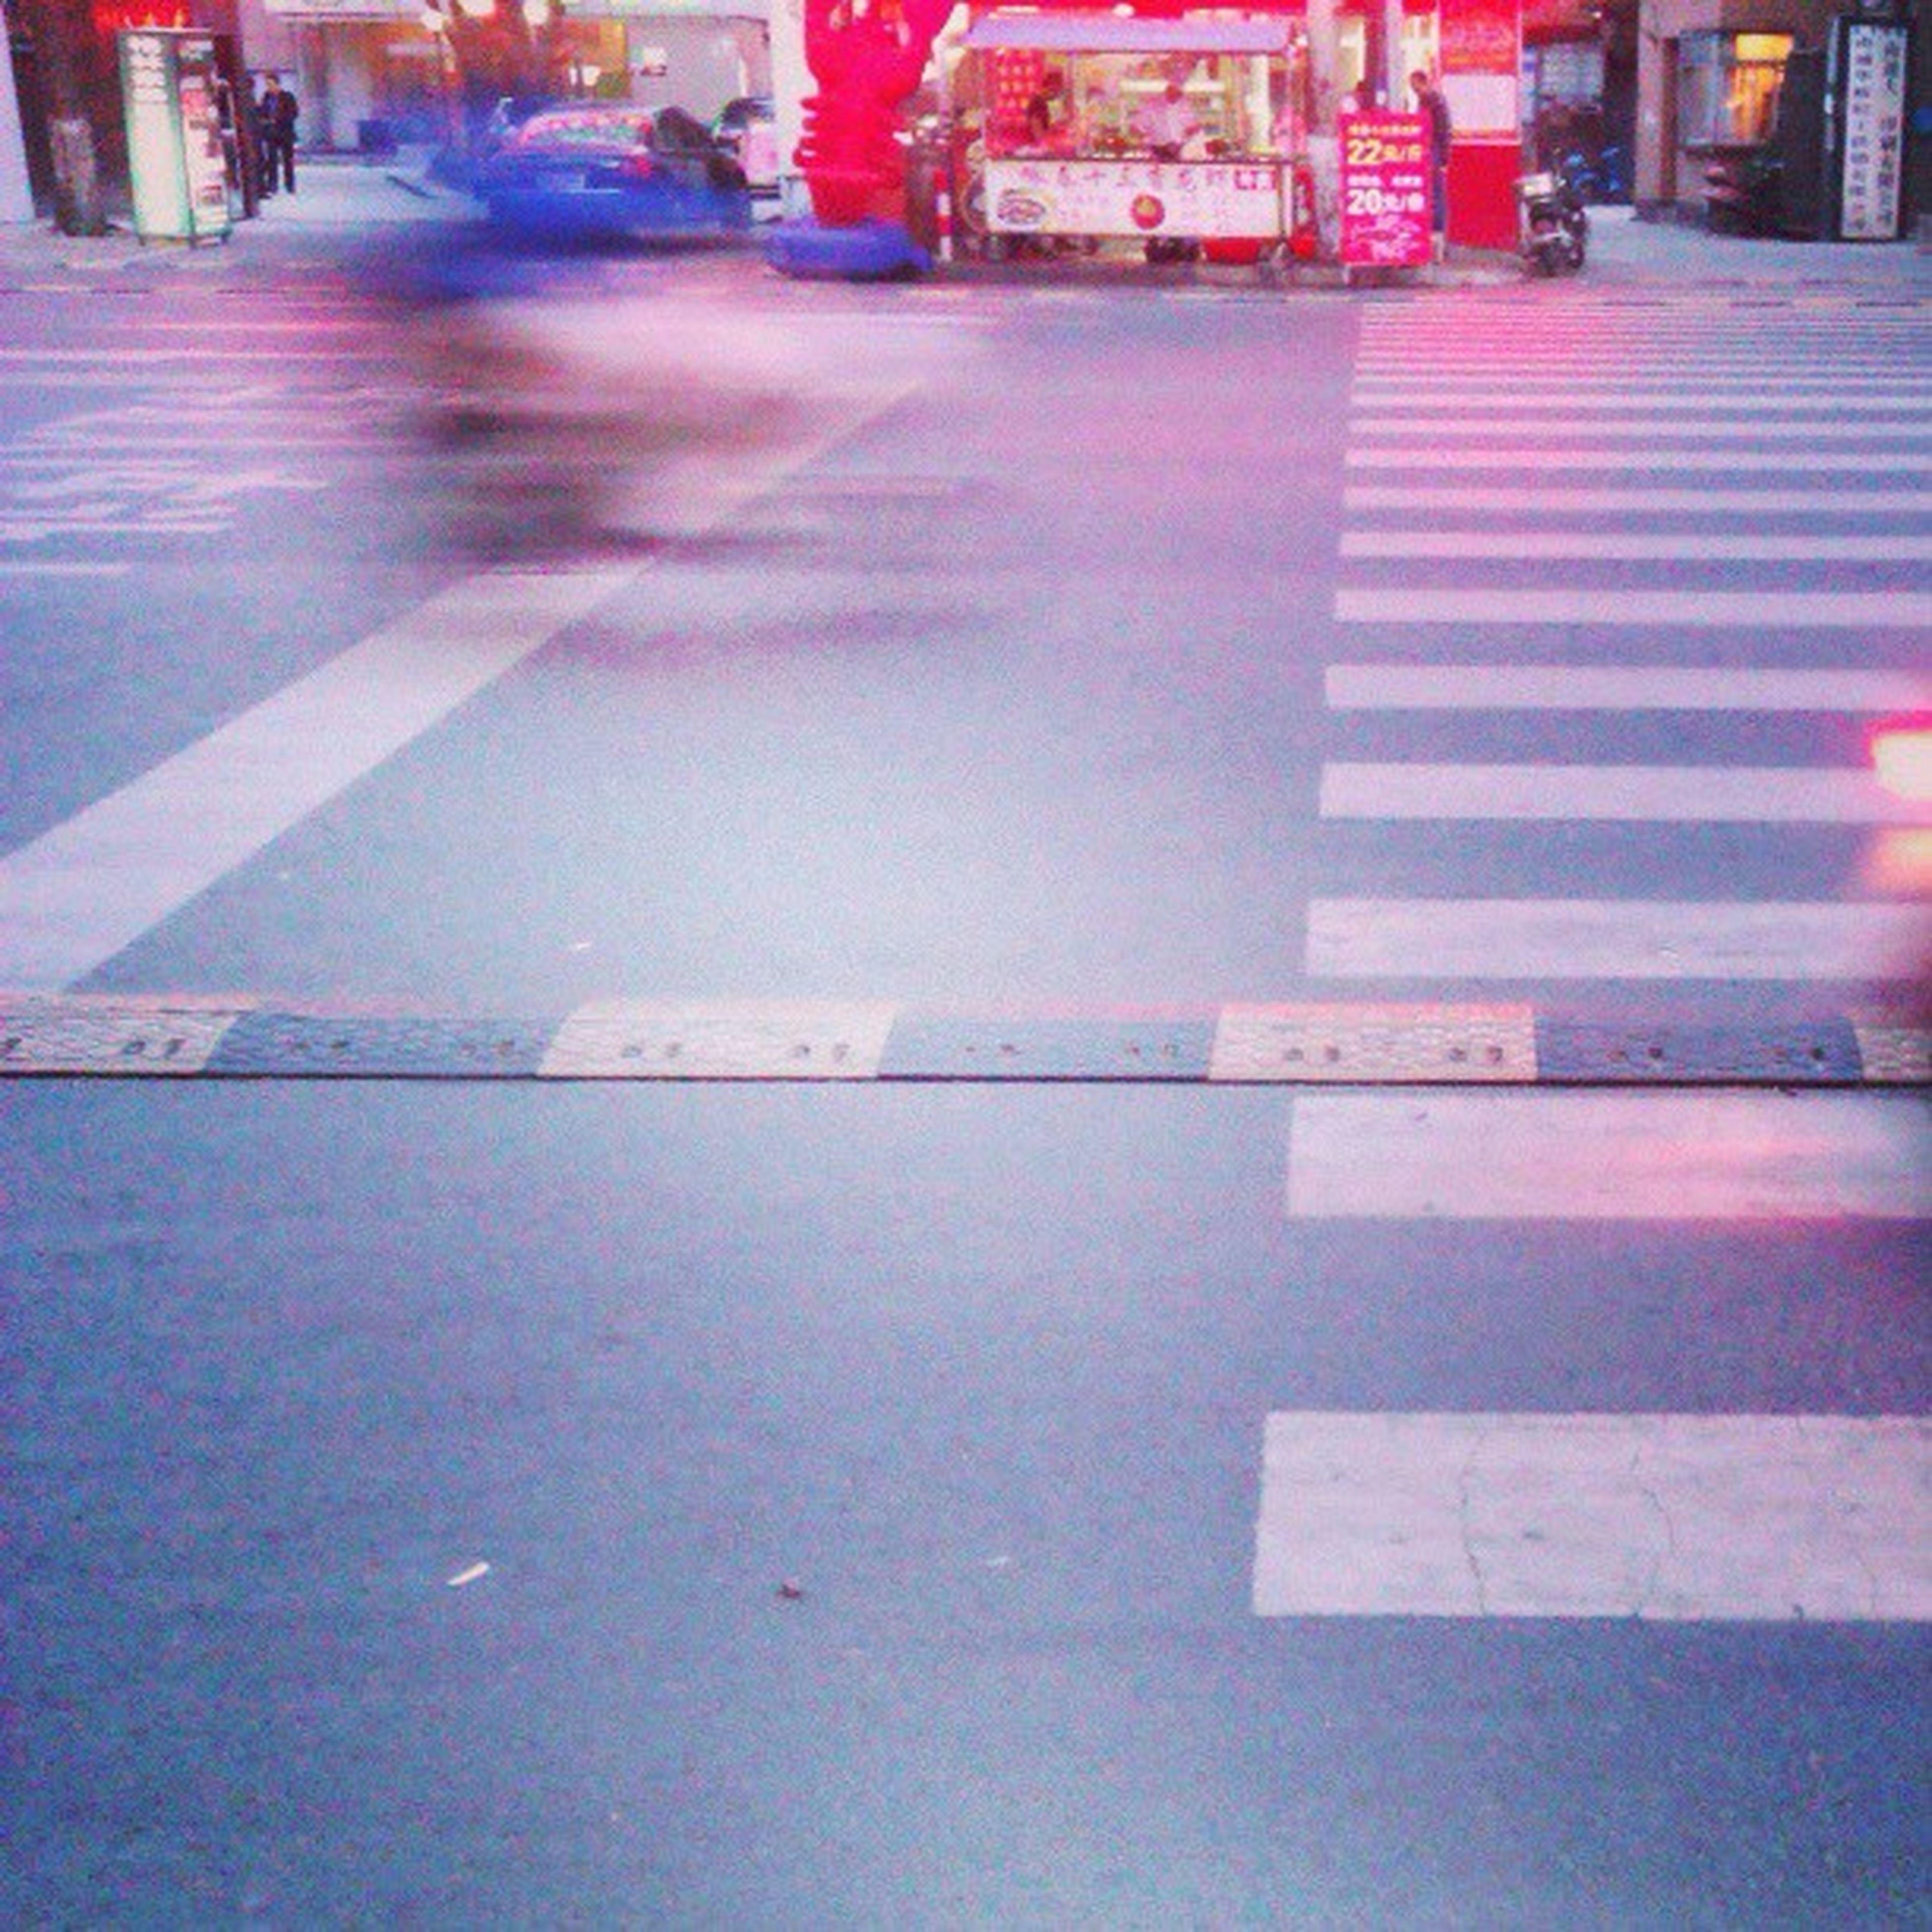 street, illuminated, city, night, transportation, reflection, road, building exterior, architecture, car, city street, built structure, city life, wet, road marking, incidental people, sidewalk, land vehicle, mode of transport, zebra crossing